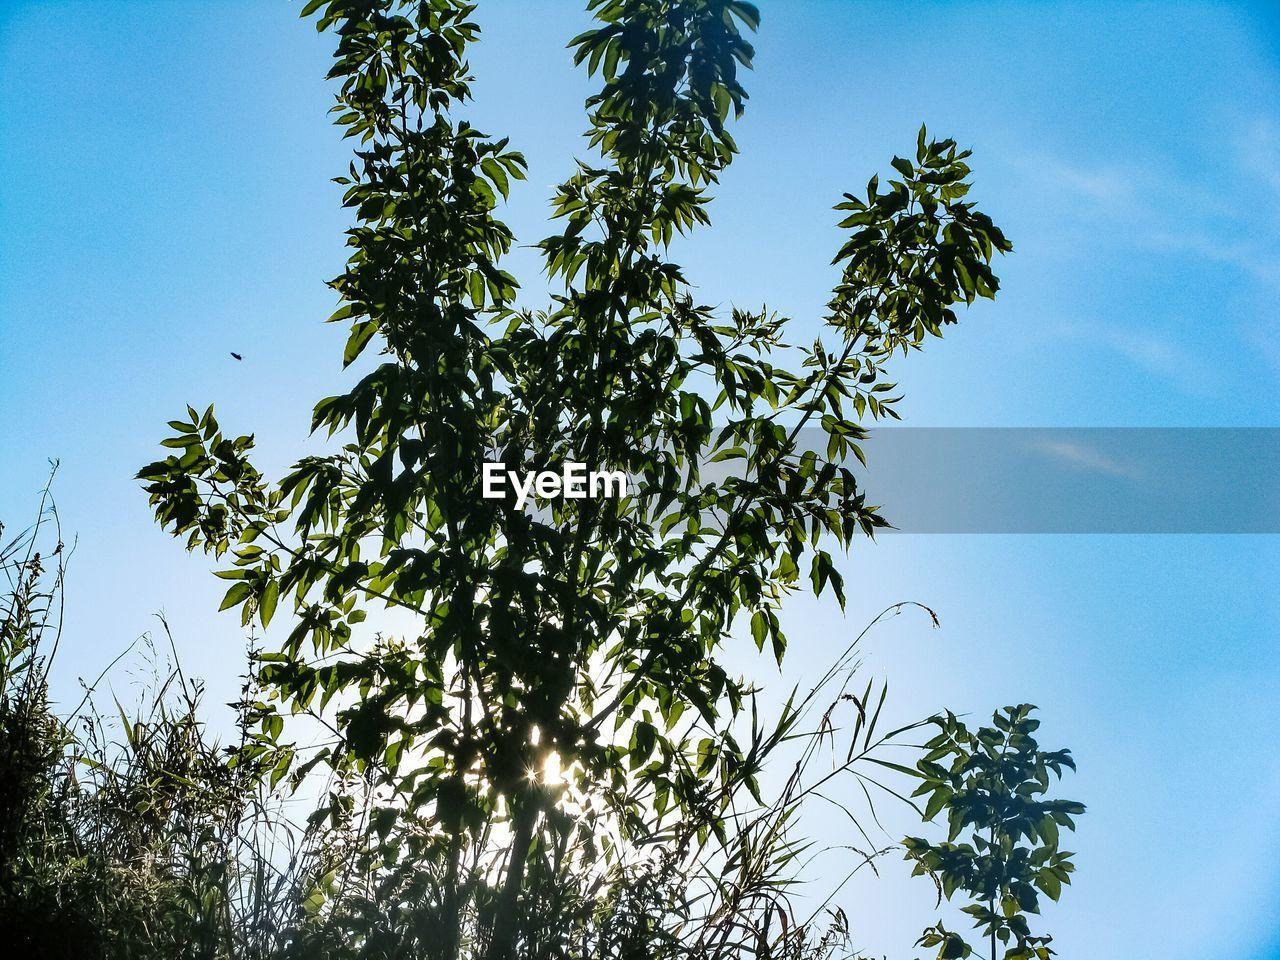 leaves, blue sky, freedom, growth, nature, adventure, sunshine, clear sky, tree, high, sky, no people